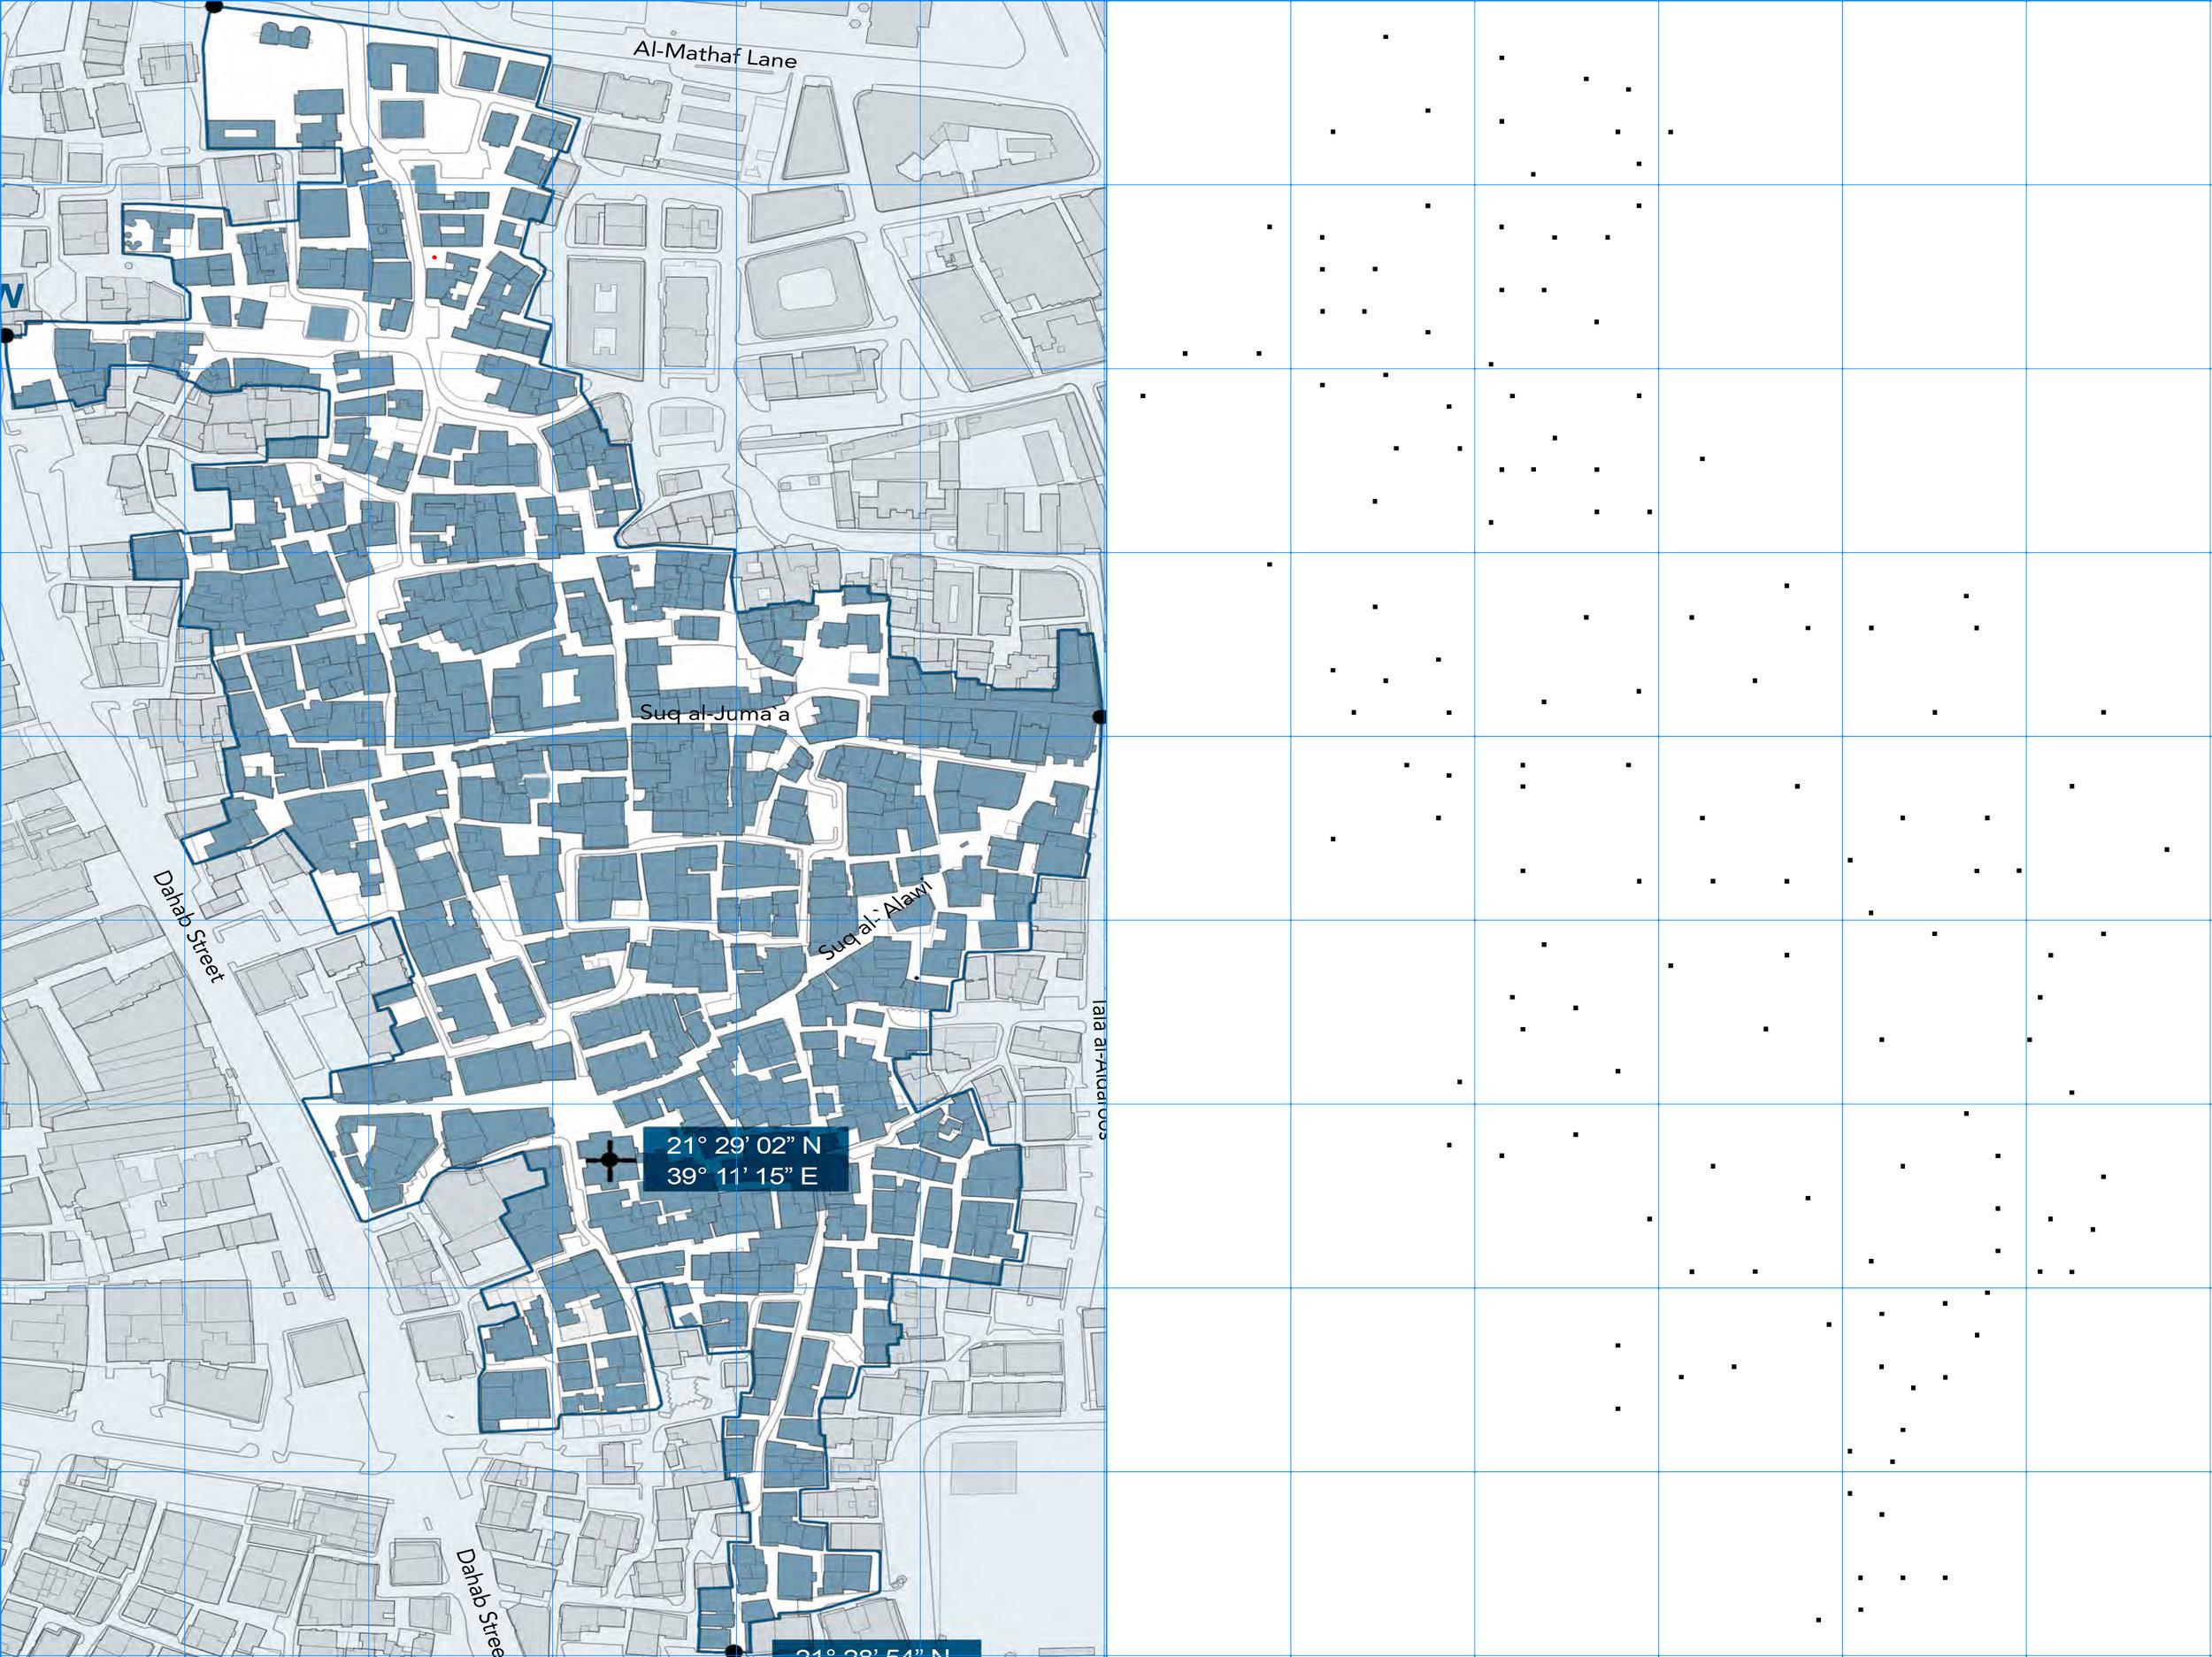 bab map and dot map.jpg